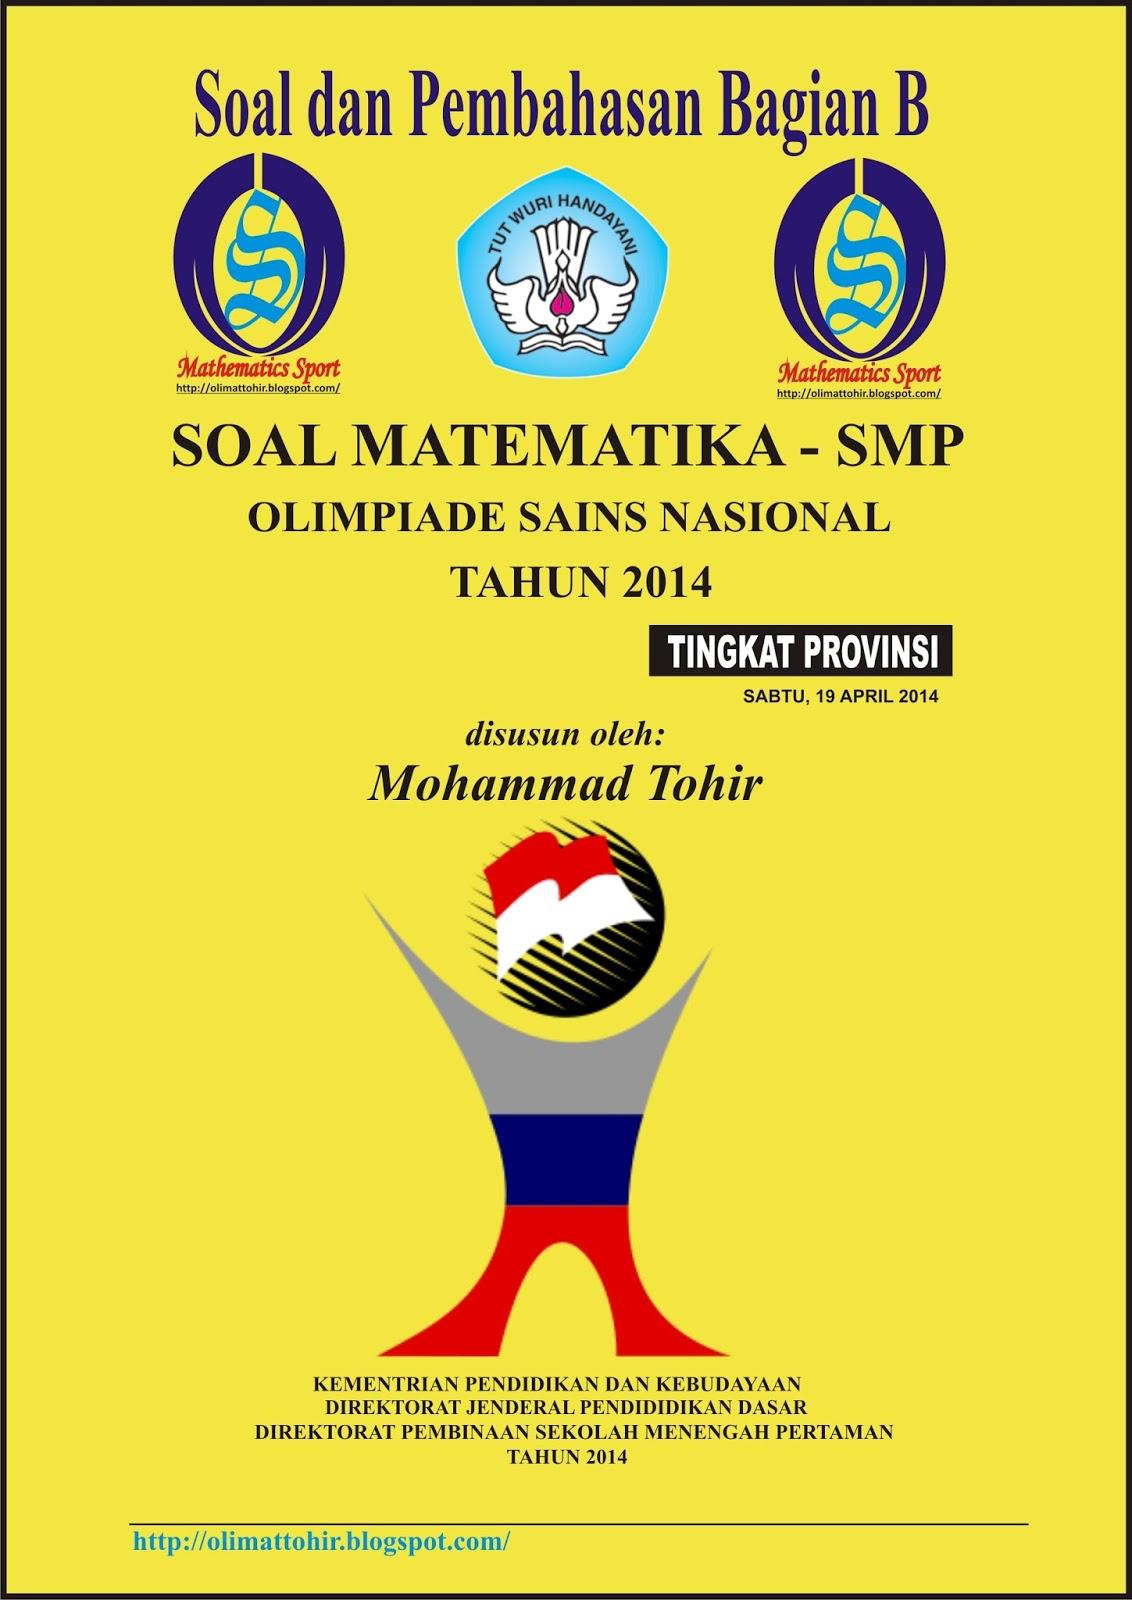 Mathematics Sport Soal Dan Pembahasan Osn Matematika Smp Tingkat Provinsi 2014 Bagian B Uraian